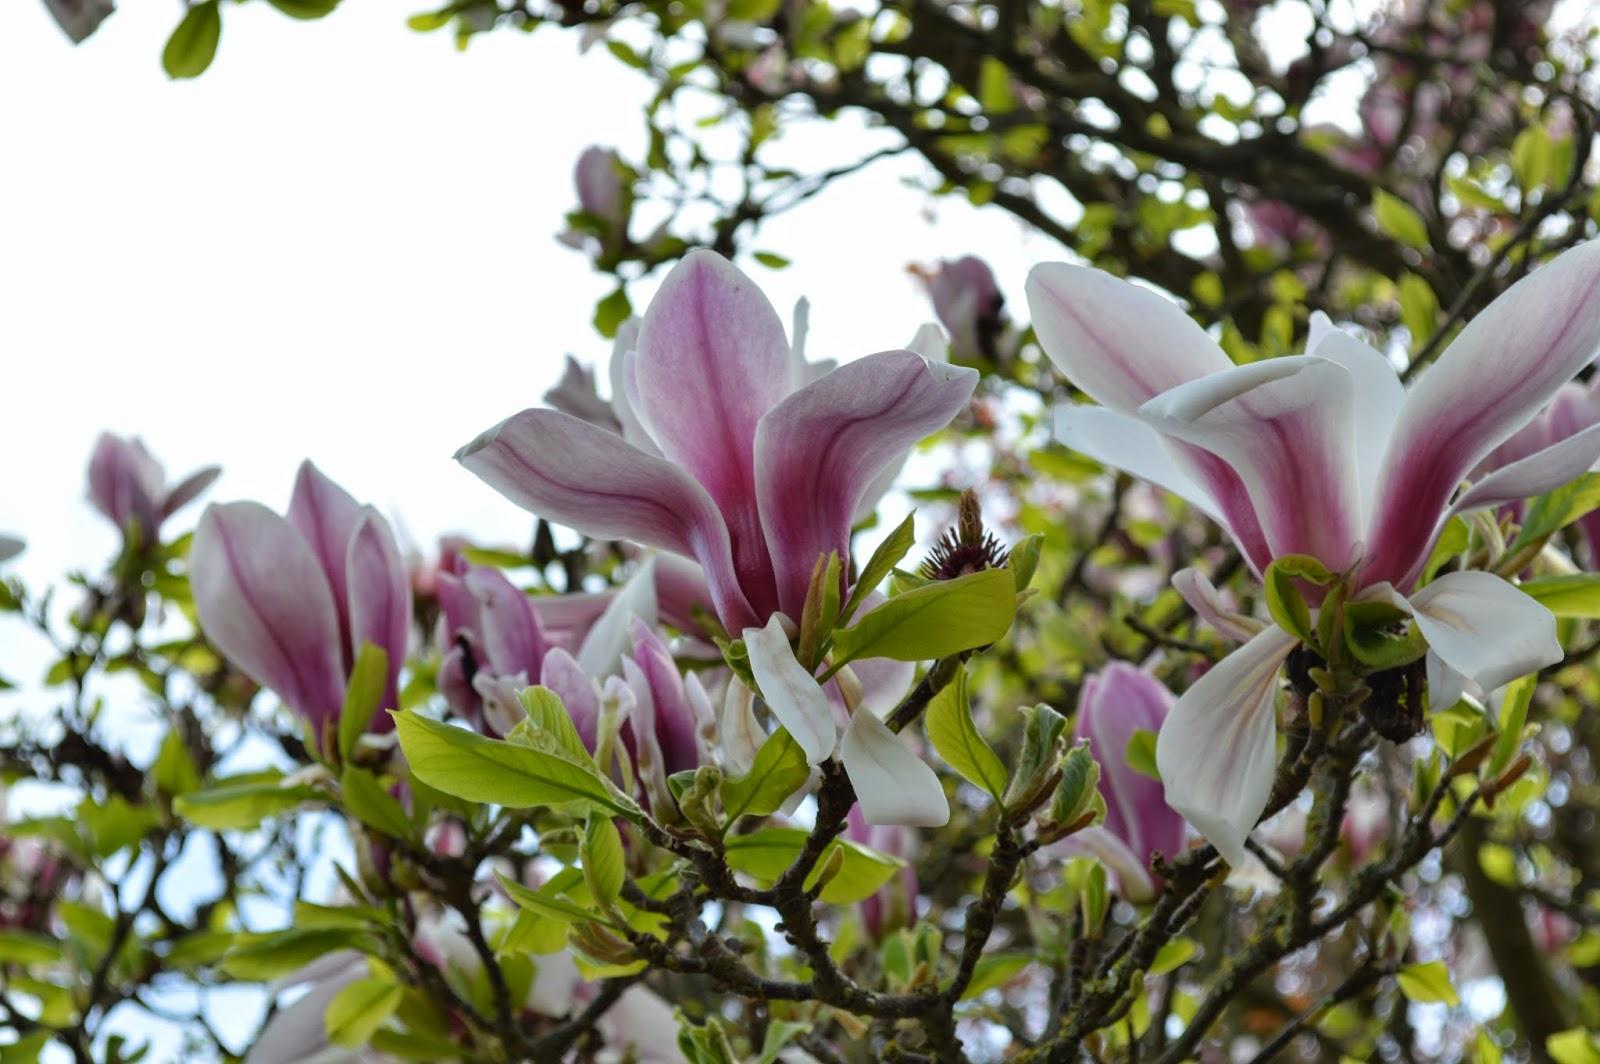 pretty, nature, magnolia, pink, purple, white, garden, full bloom, flowers, tree, garden, sky, photo, photograph, Canterbury